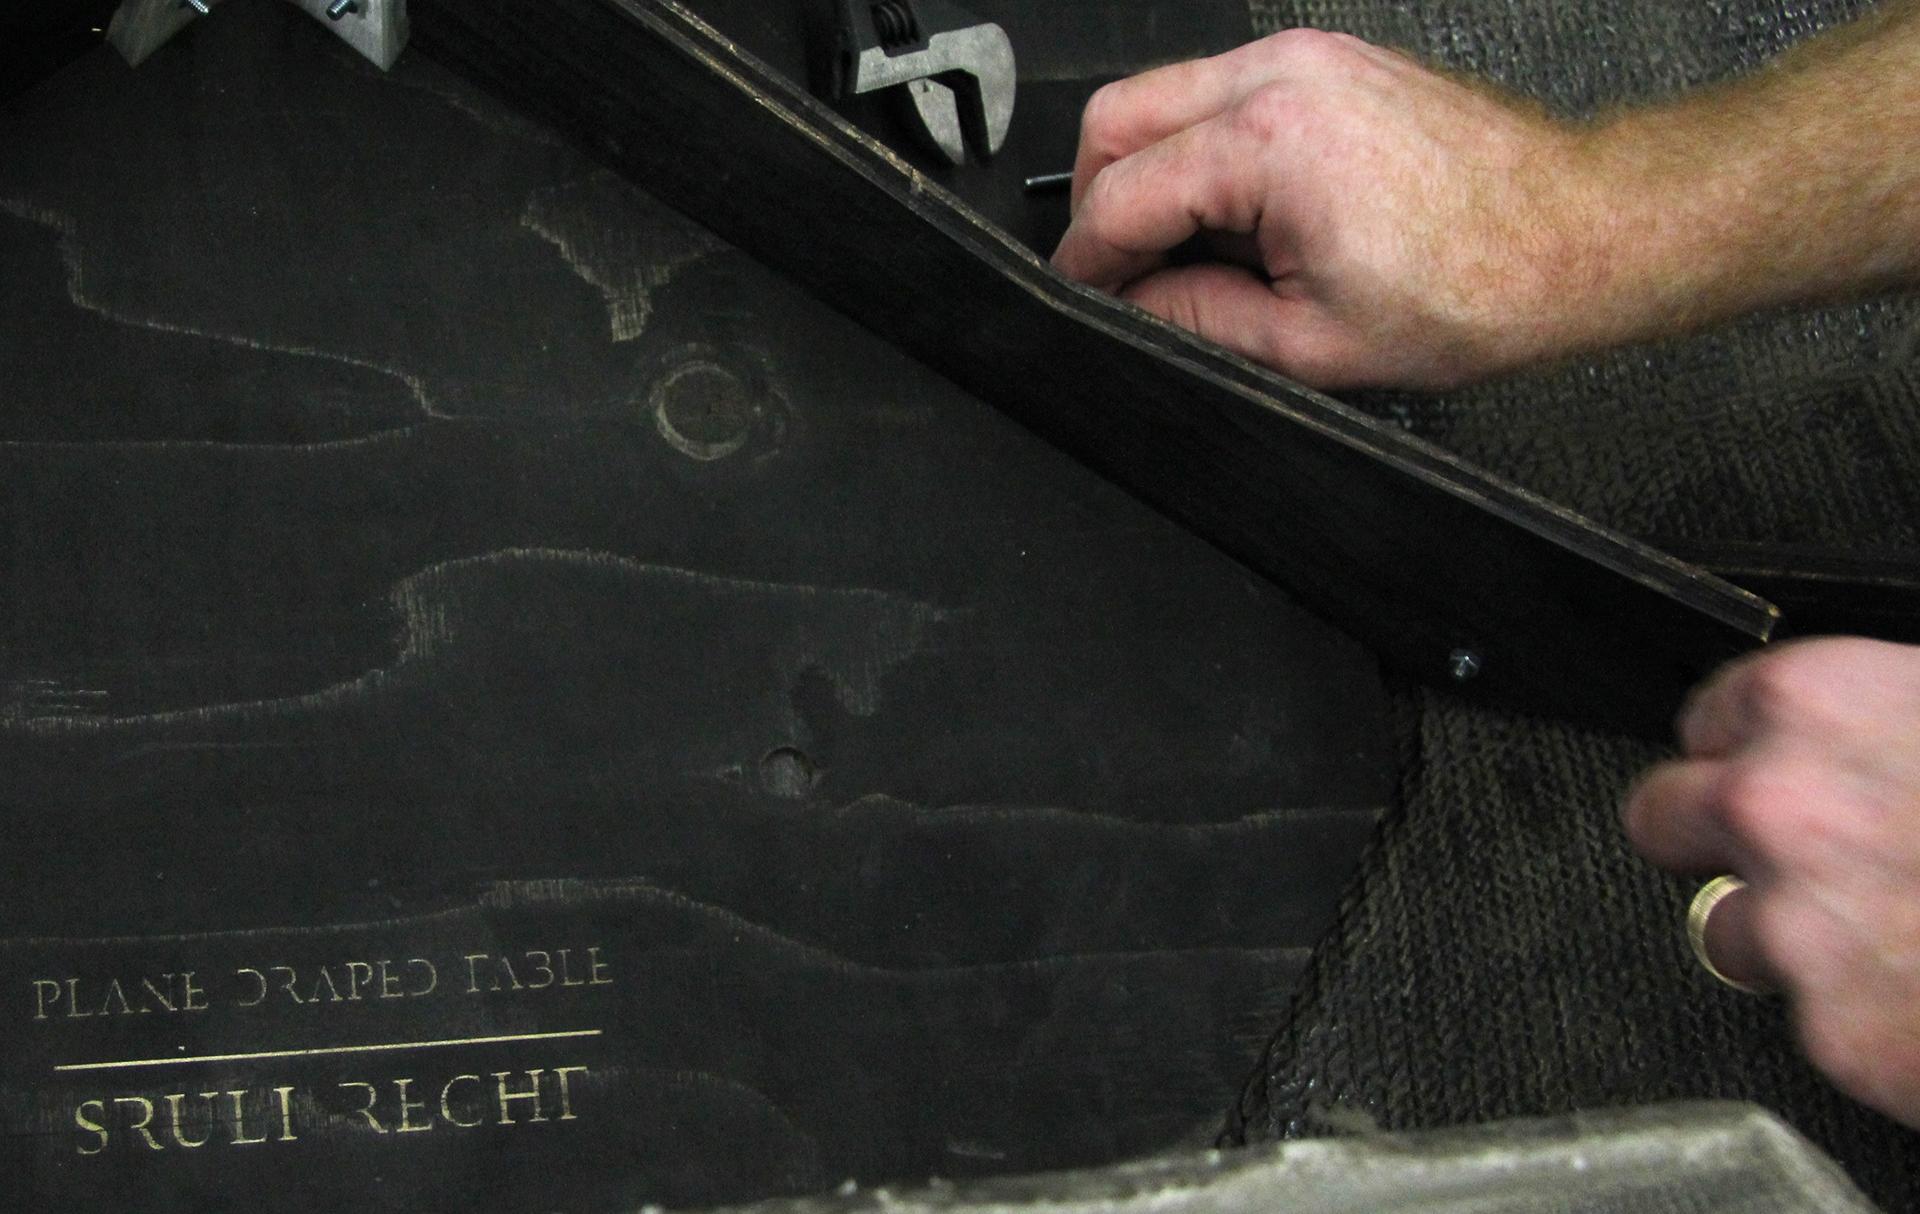 Sruli Recht - Plane Draped Table.jpg